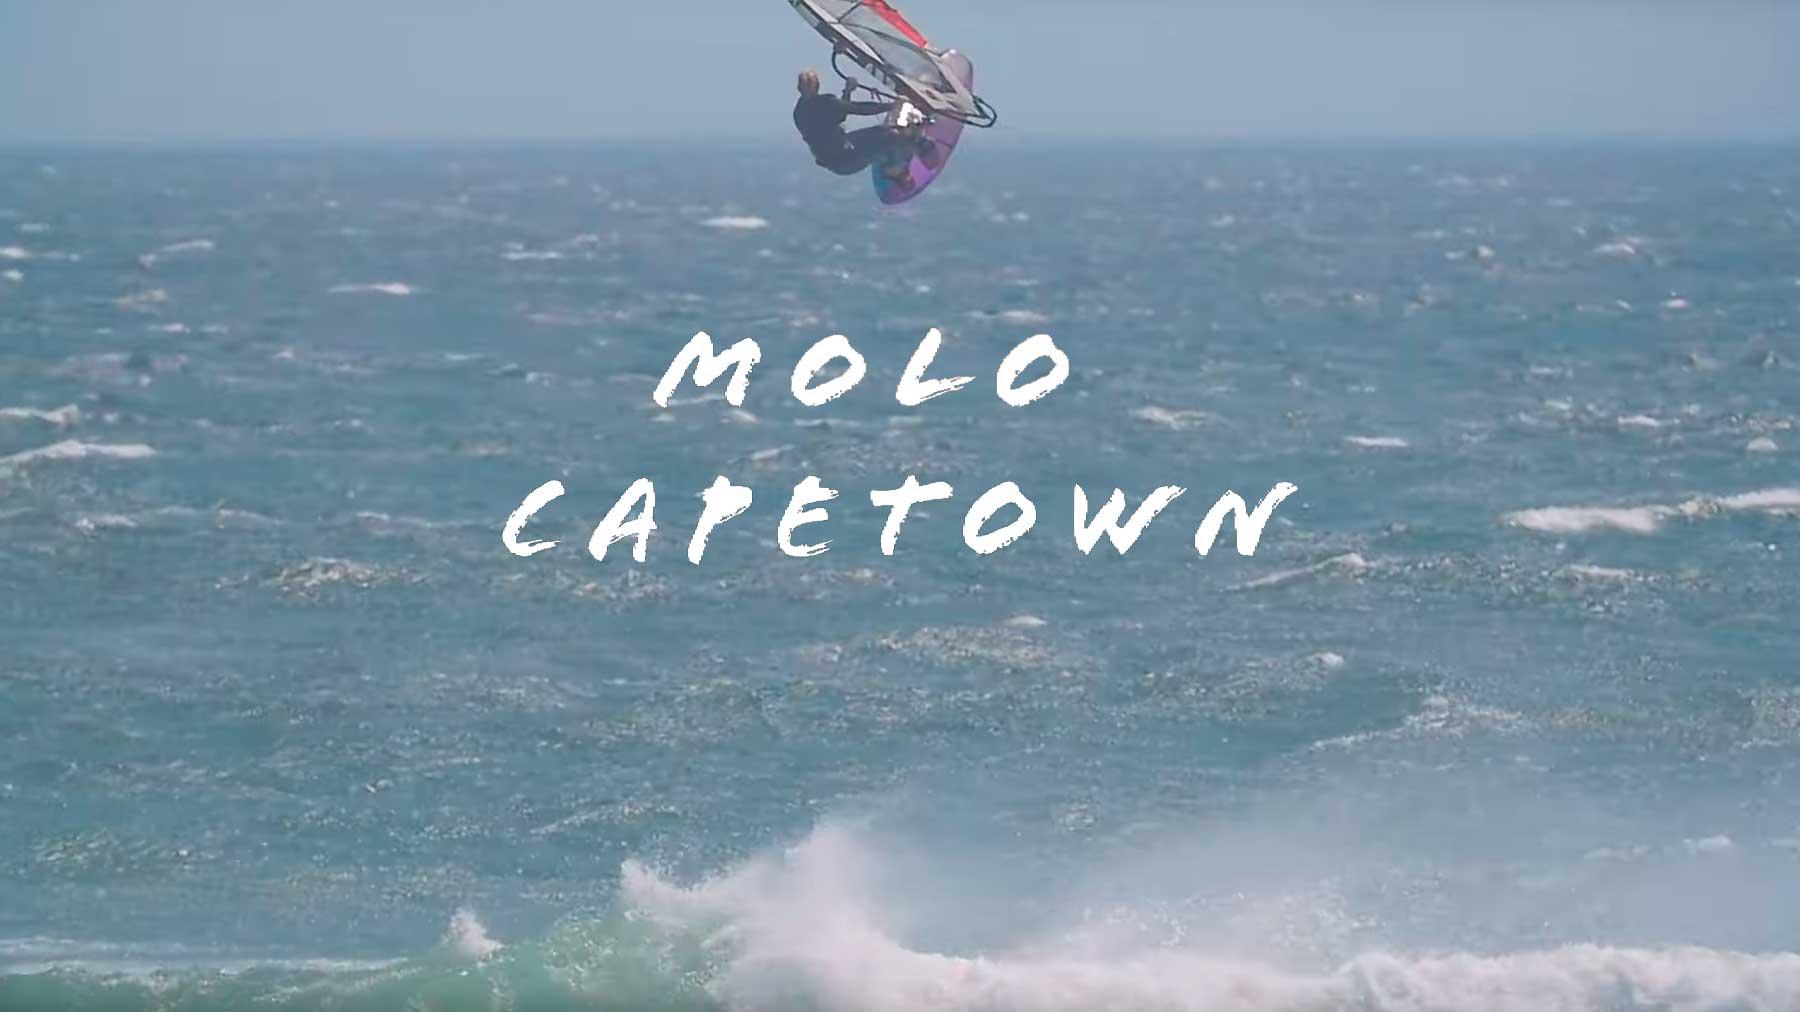 Molo Cape Town by Amado Vrieswijk